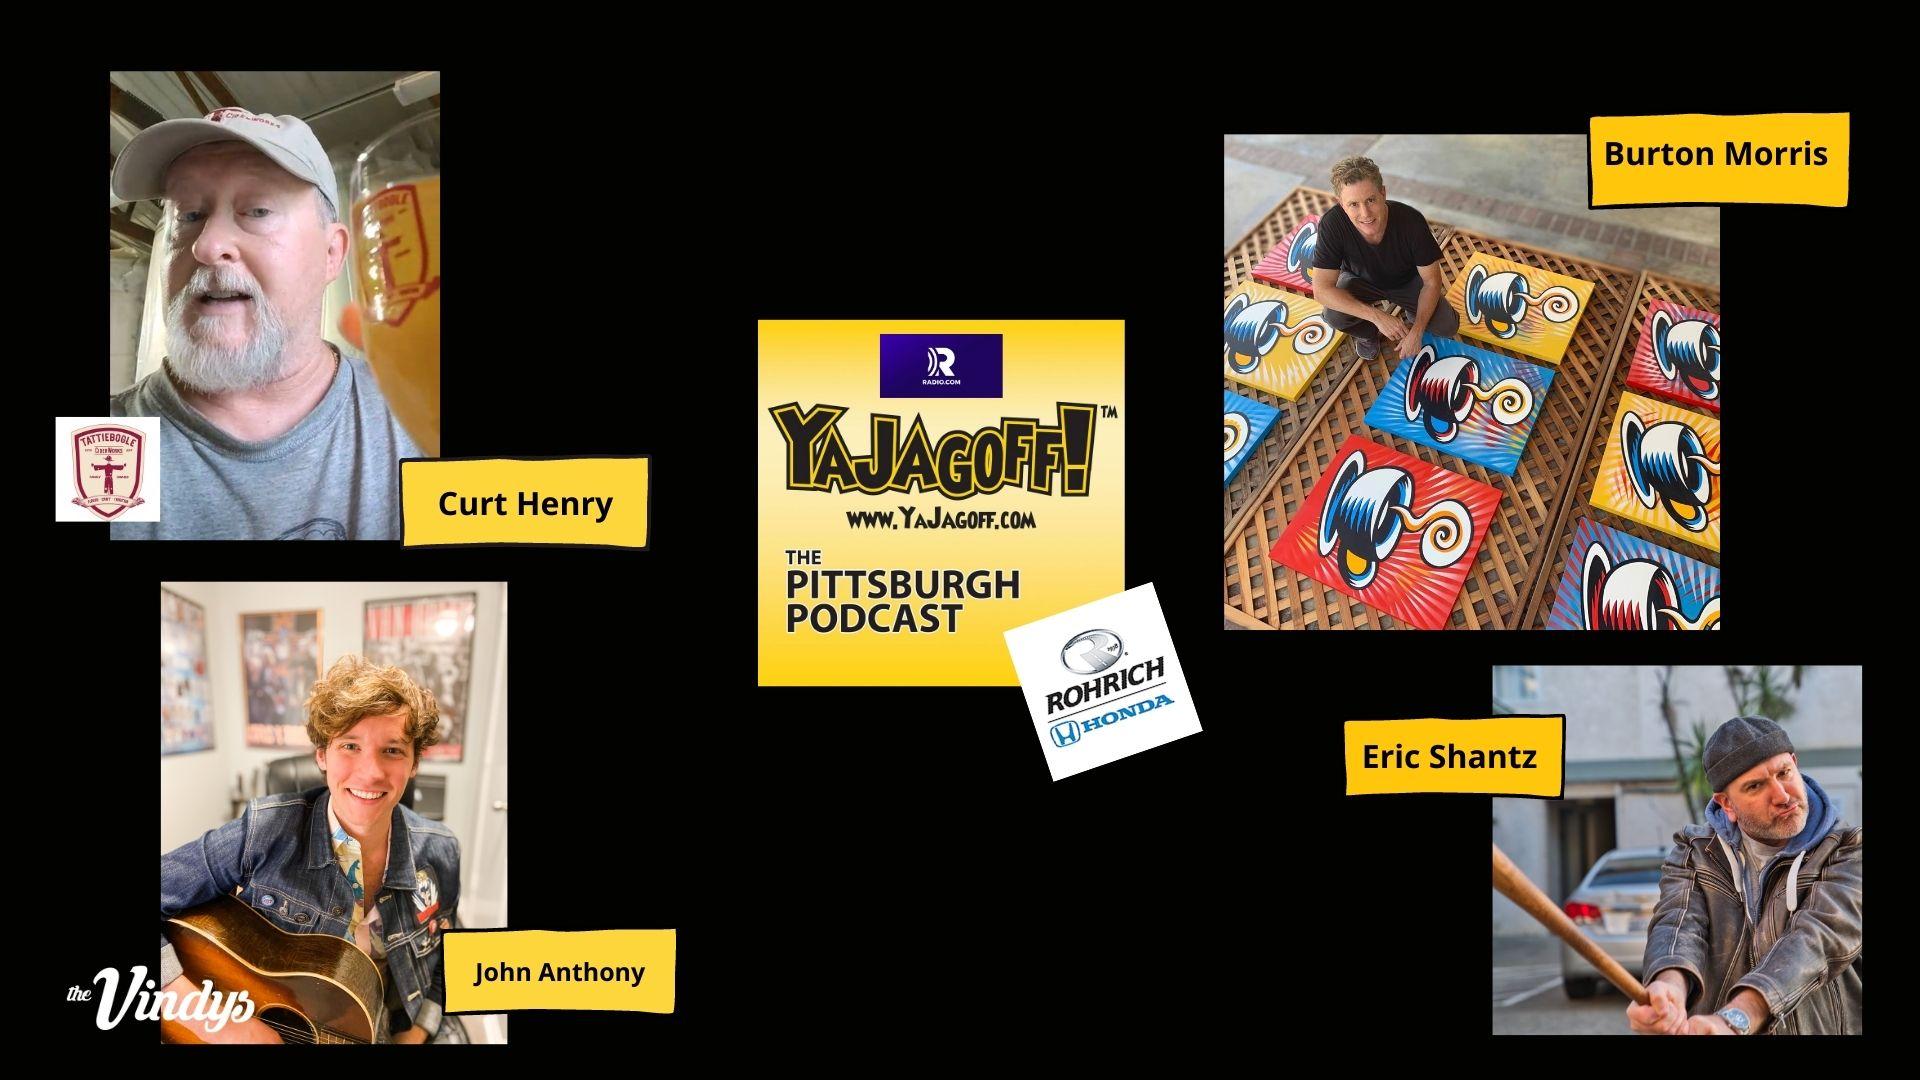 YaJagoff Podcast with Burton Morris